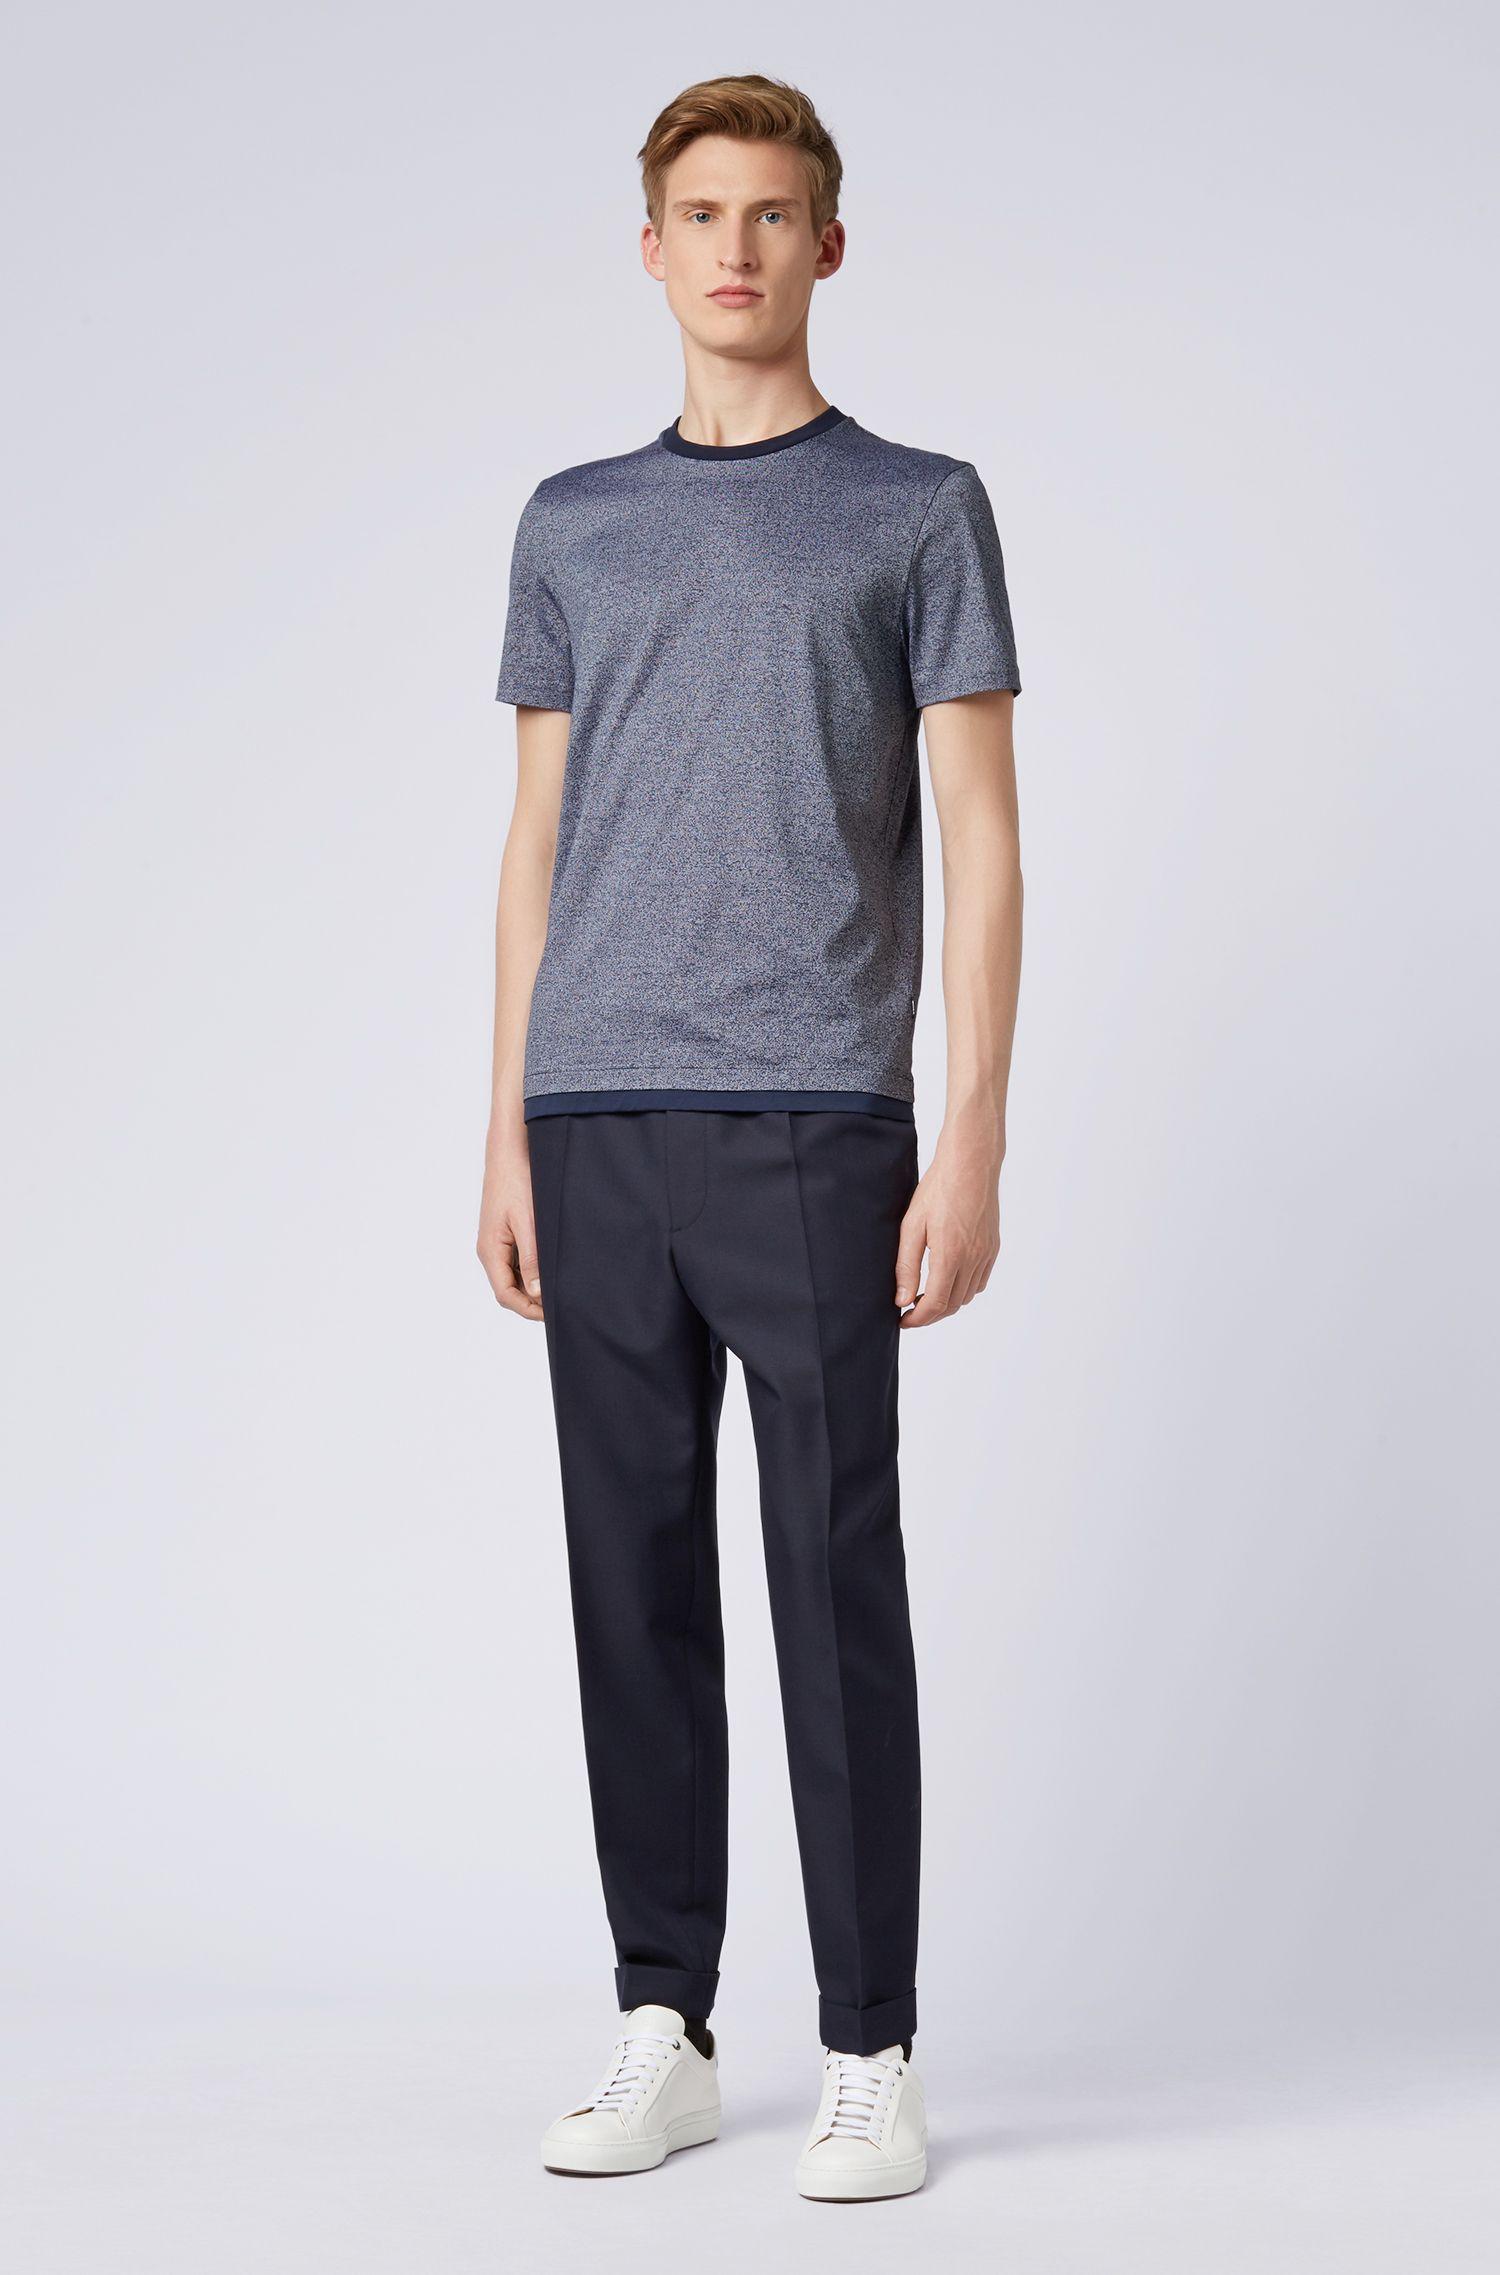 Camiseta slim fit en algodón mouliné mercerizado, Azul oscuro